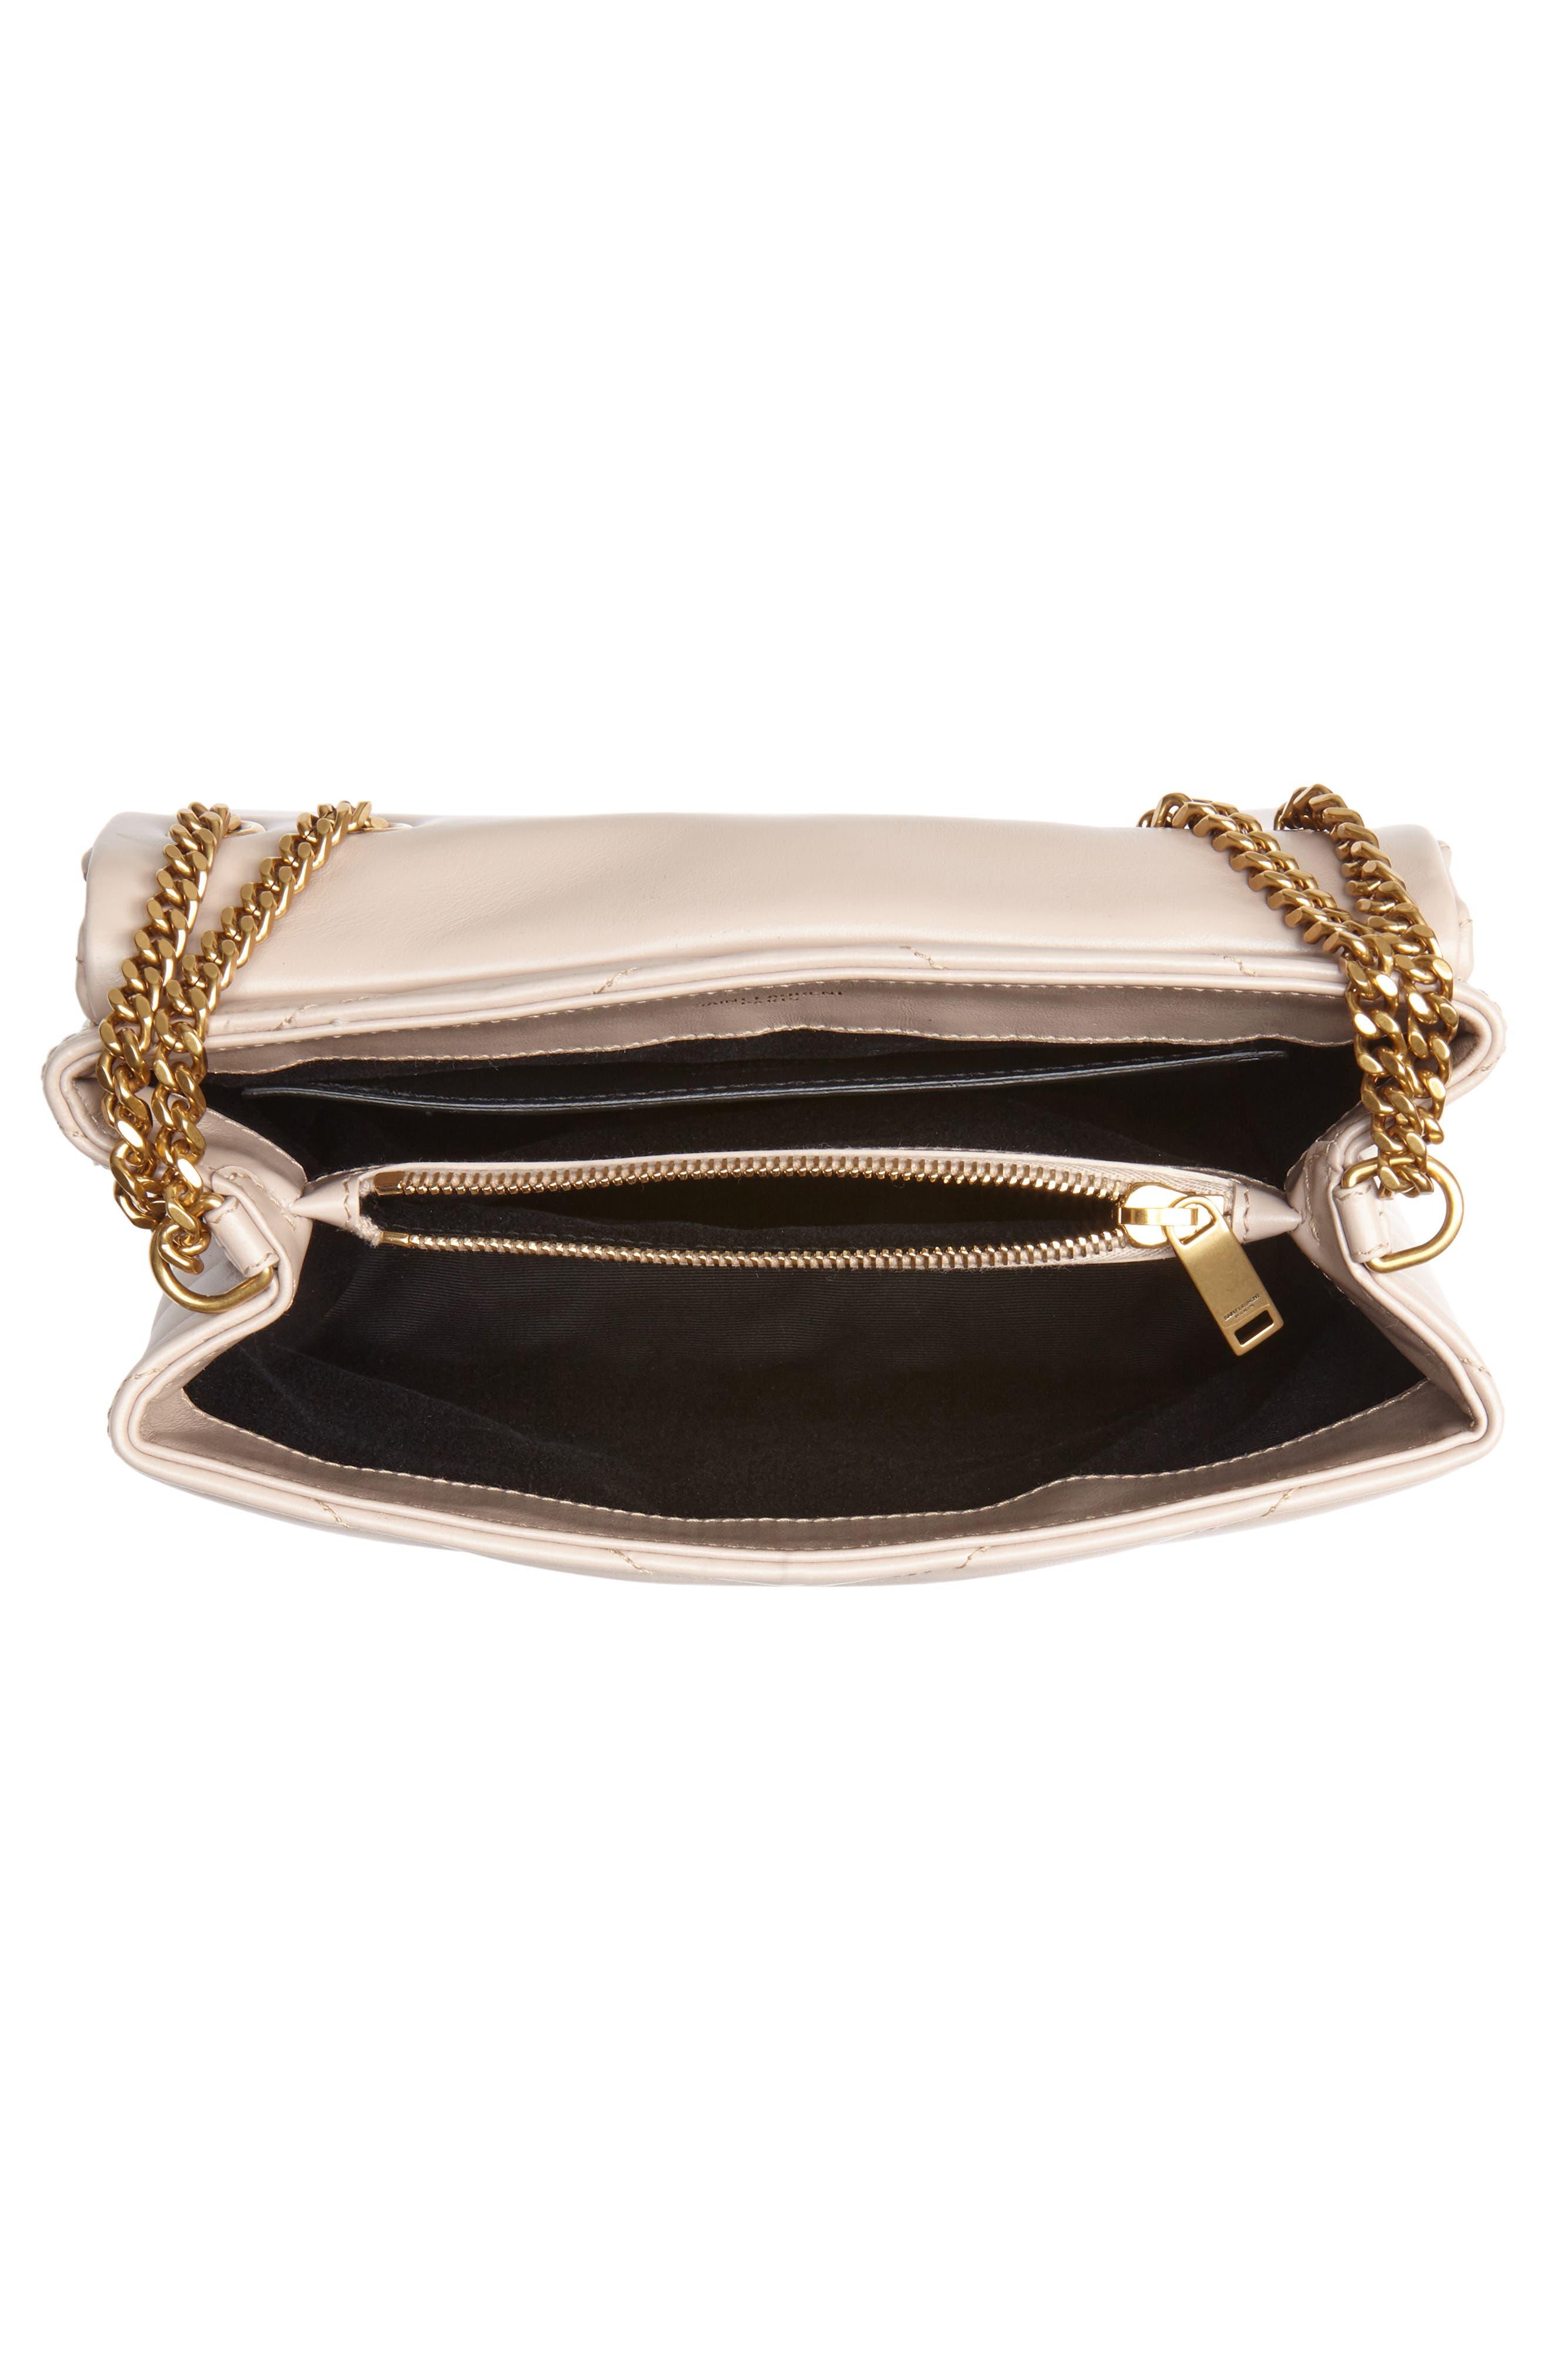 ,                             Small Loulou Leather Shoulder Bag,                             Alternate thumbnail 9, color,                             250